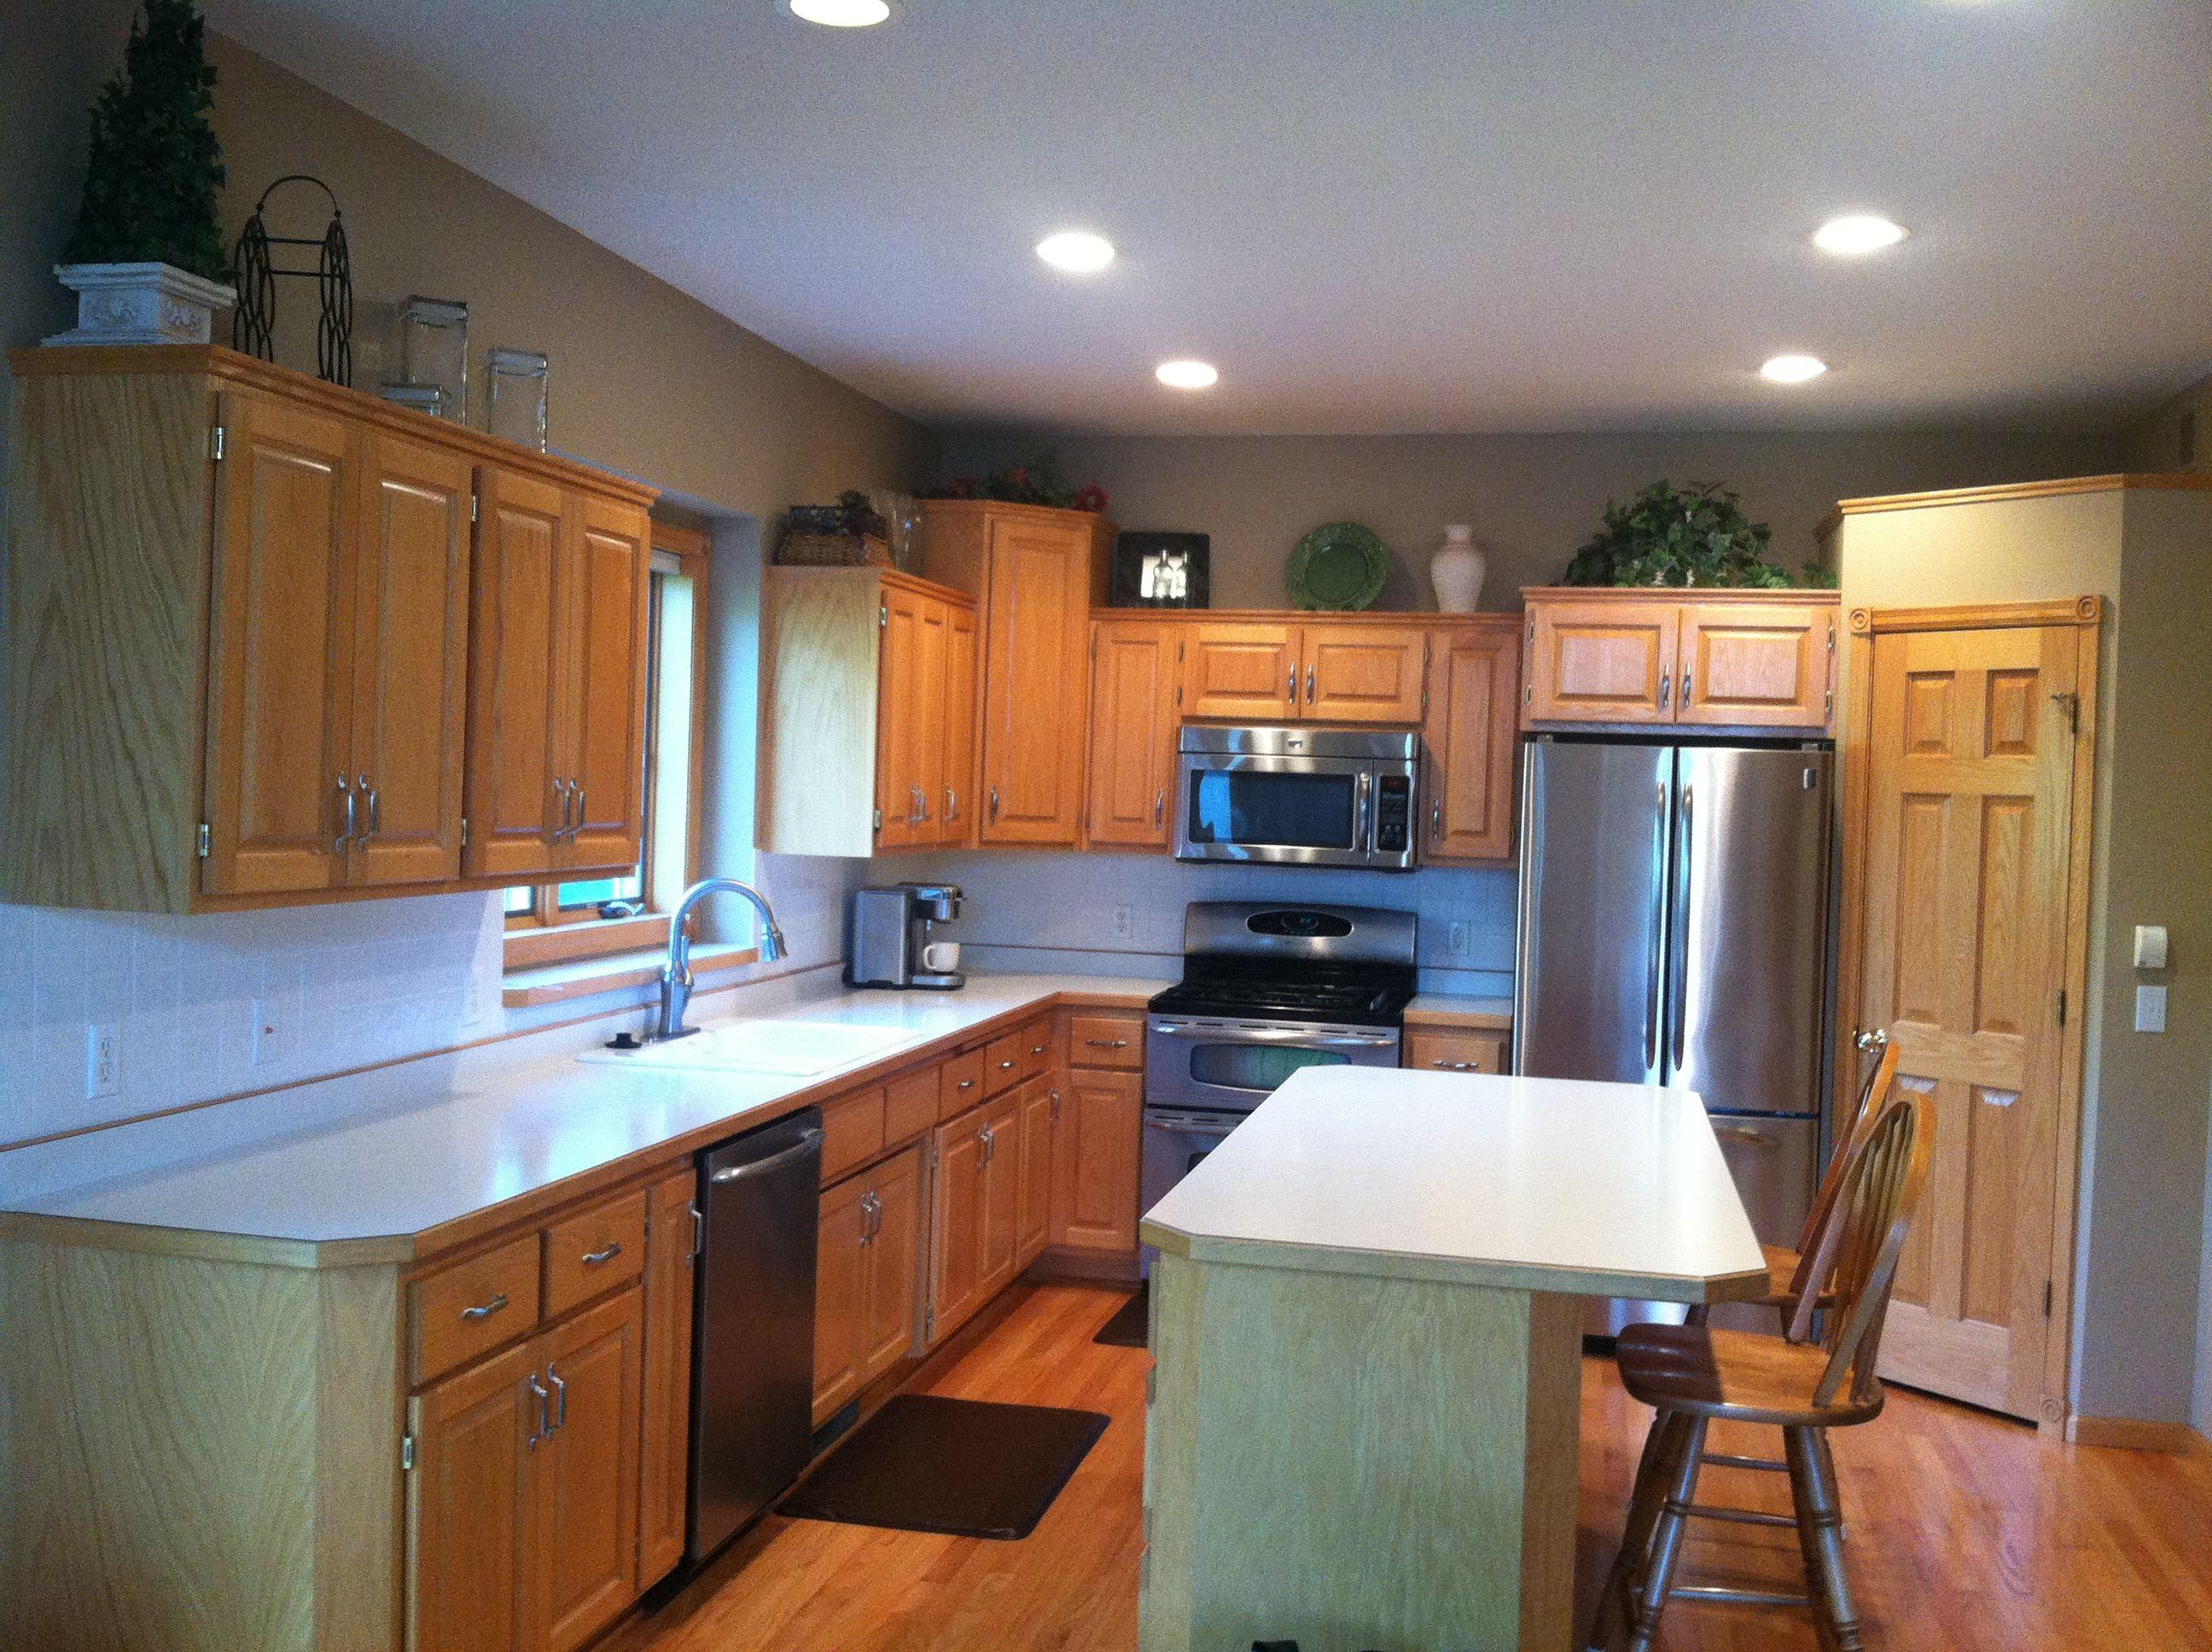 white laminate kitchen cabinets types of before photo oak with brushed nickel hardware